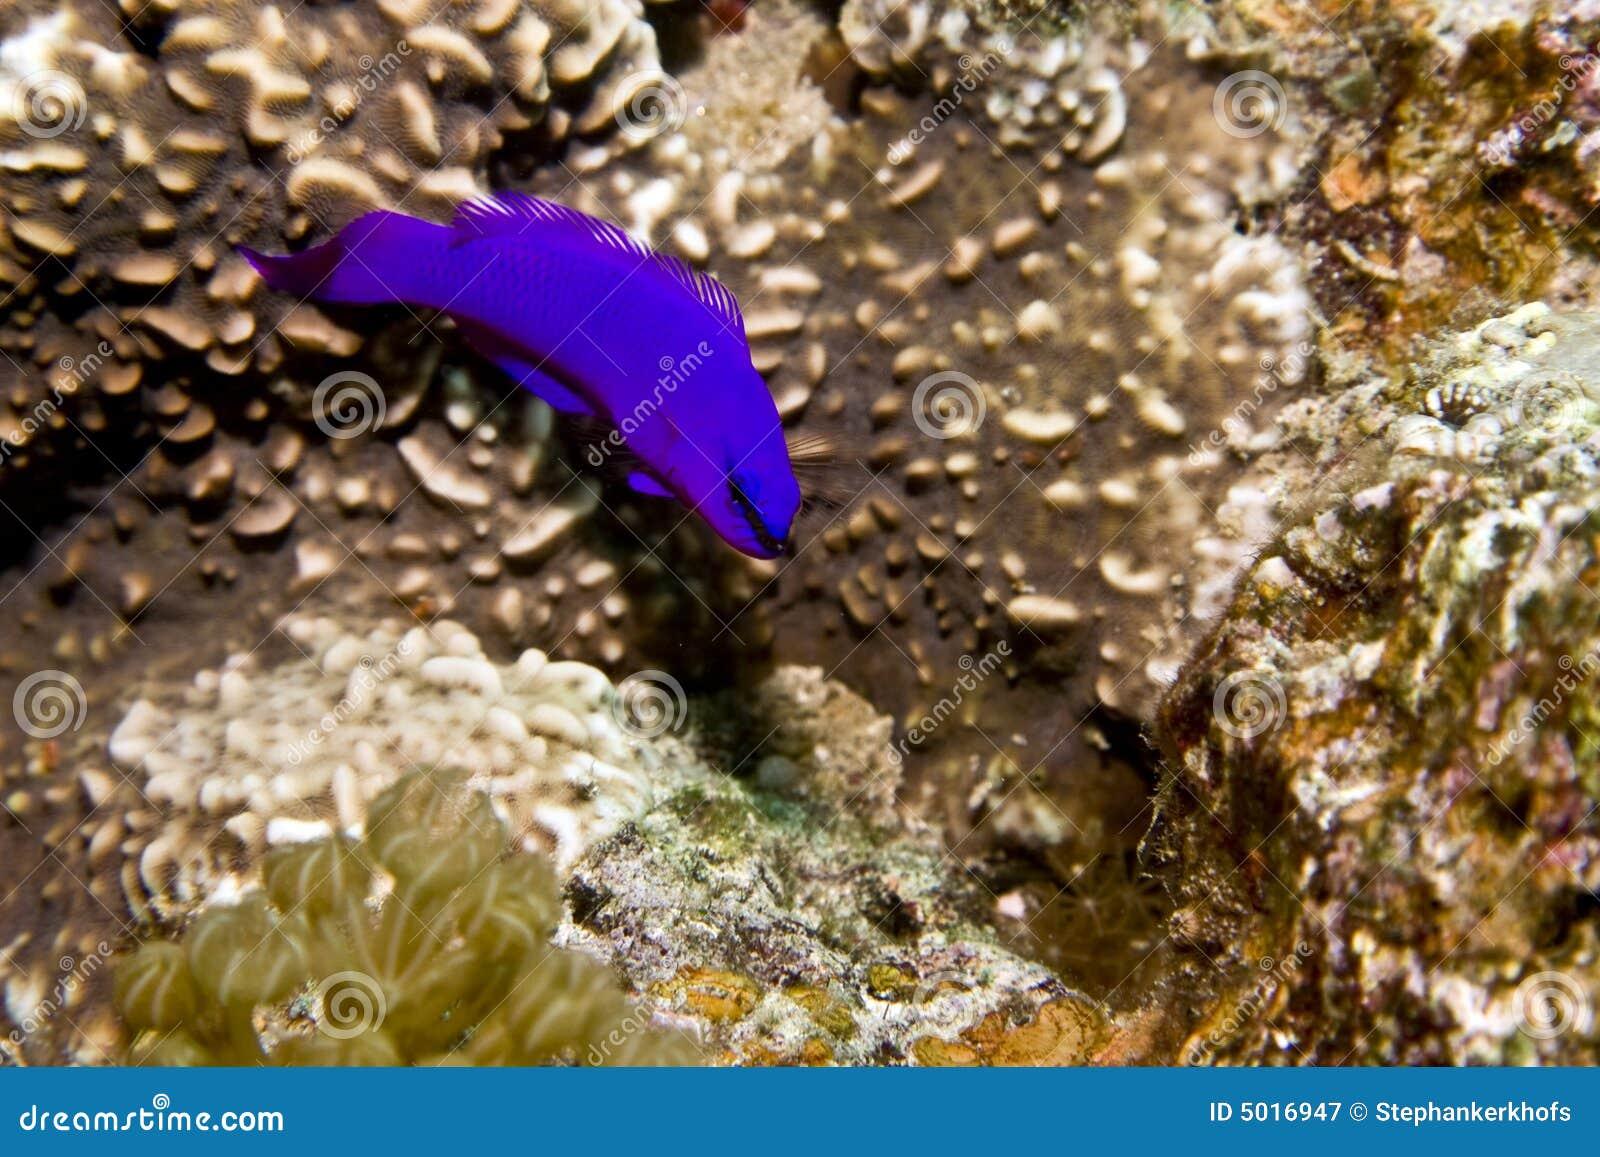 Dottyback fridmani兰花pseudochromis